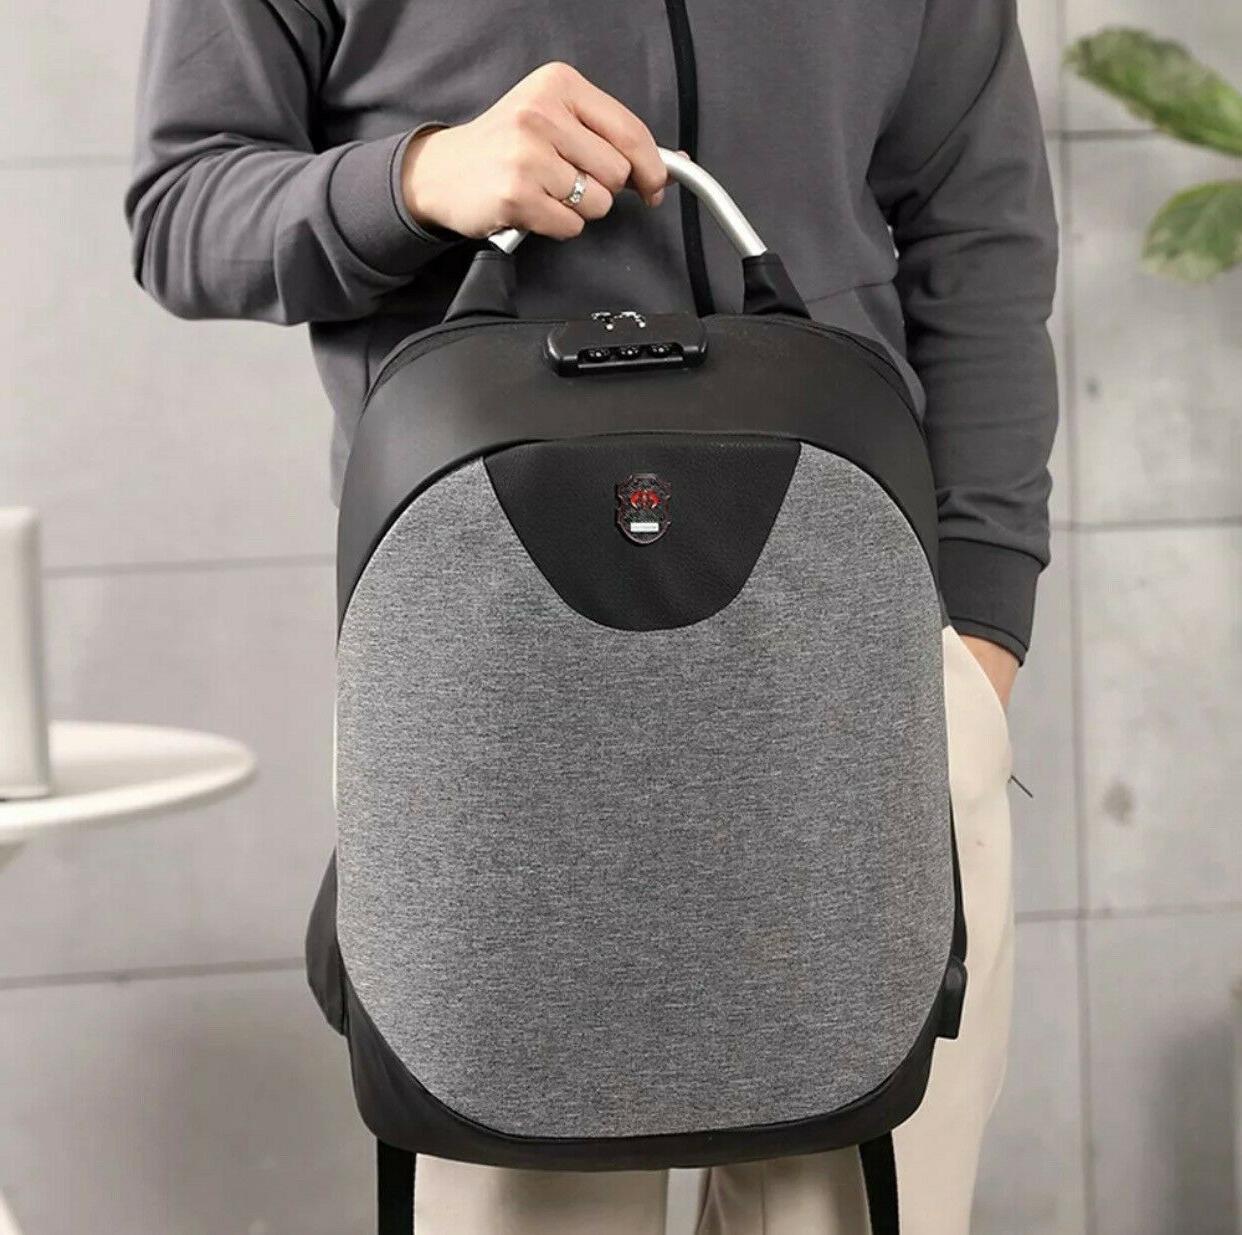 new anti theft smart bagpack